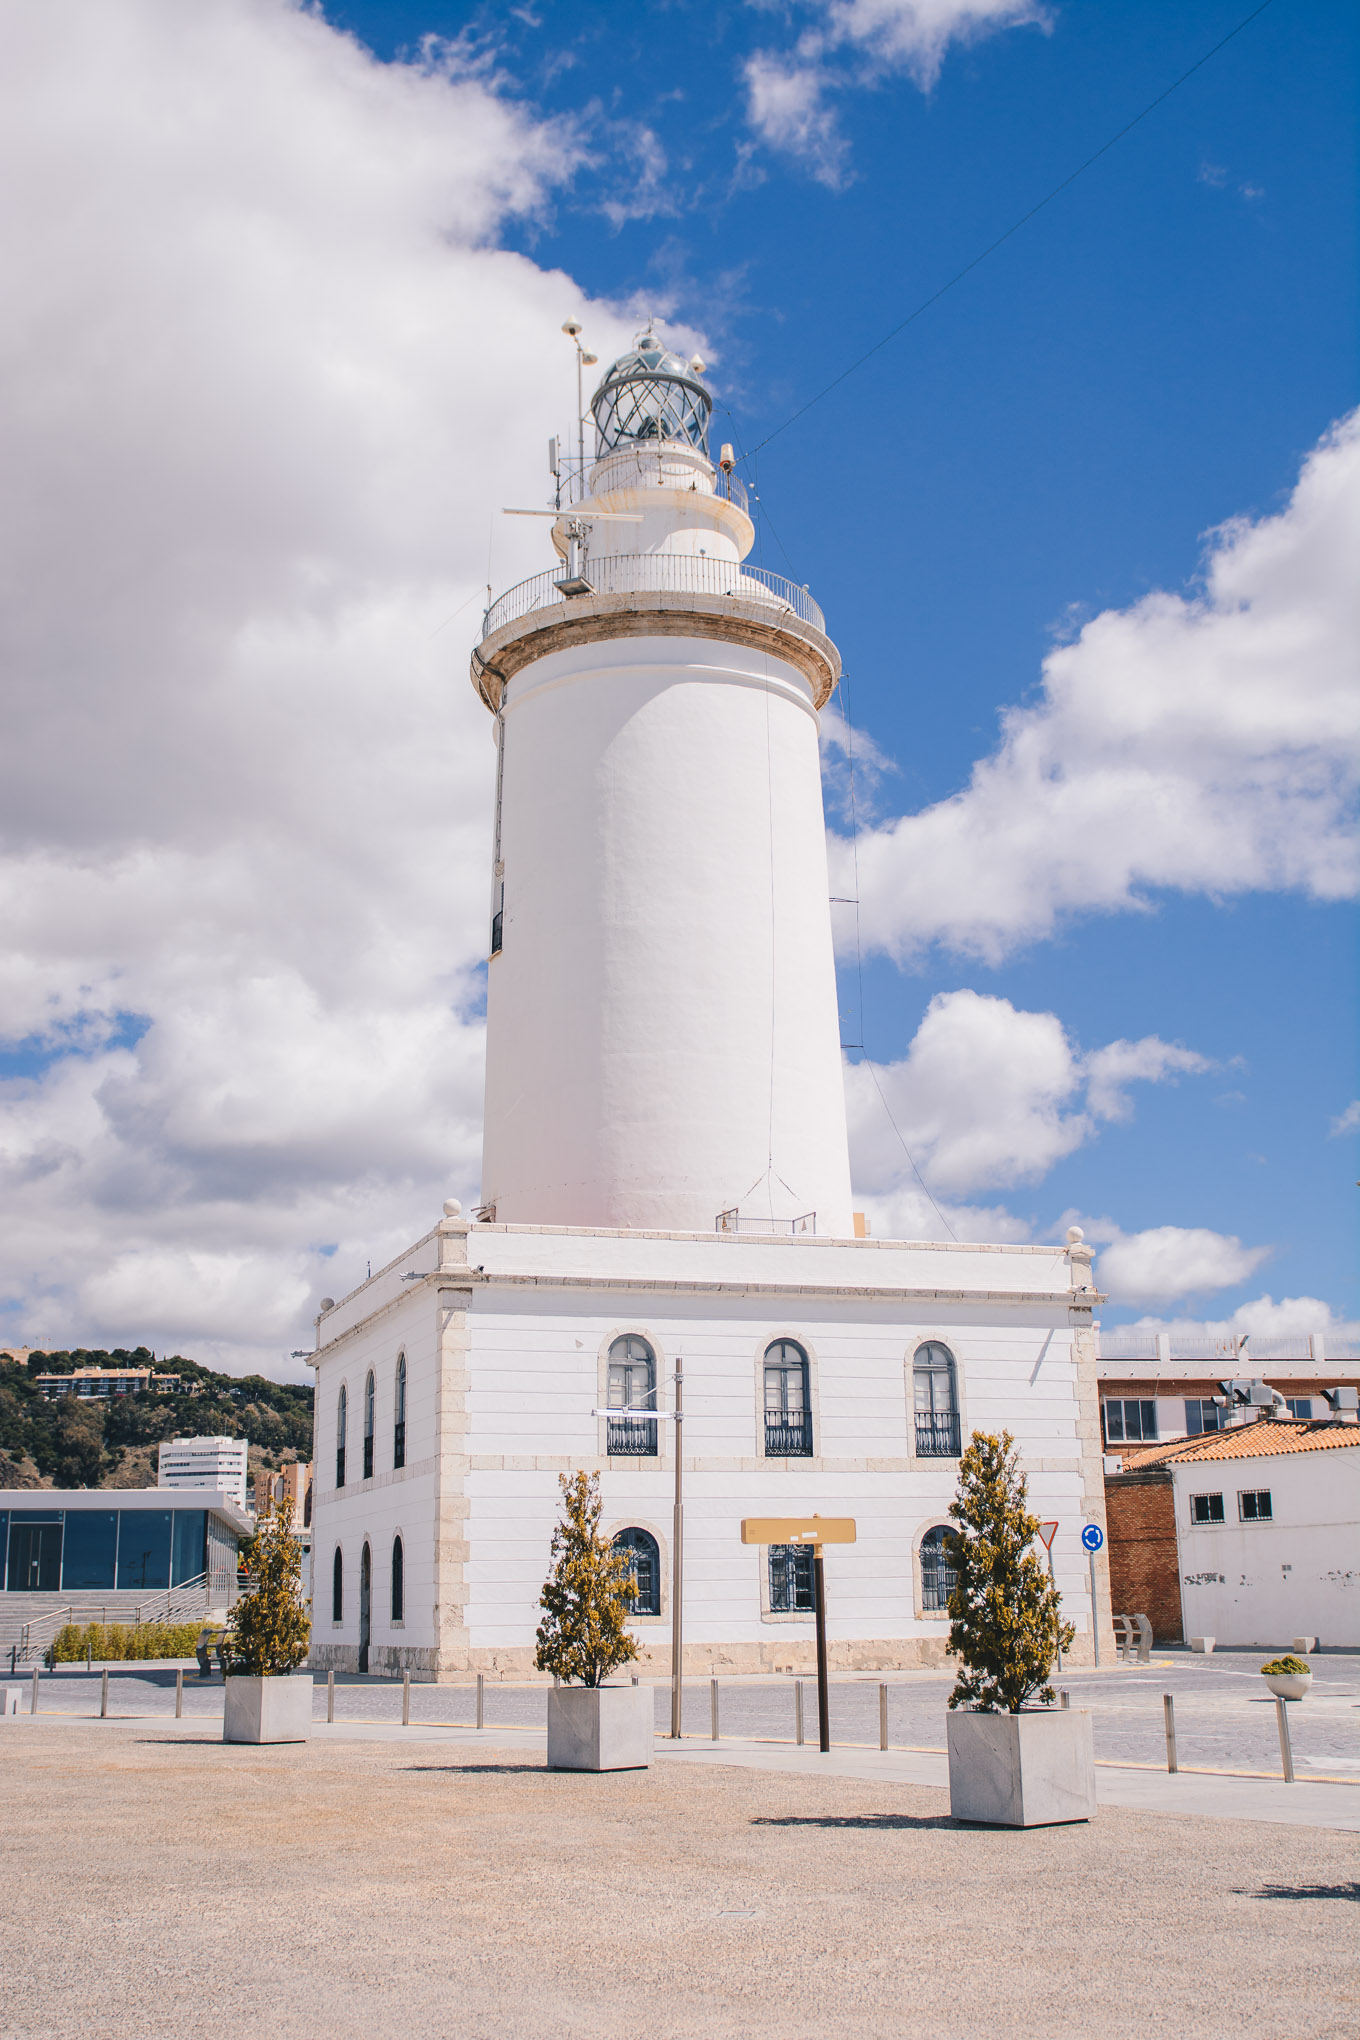 Malaga lighthouse